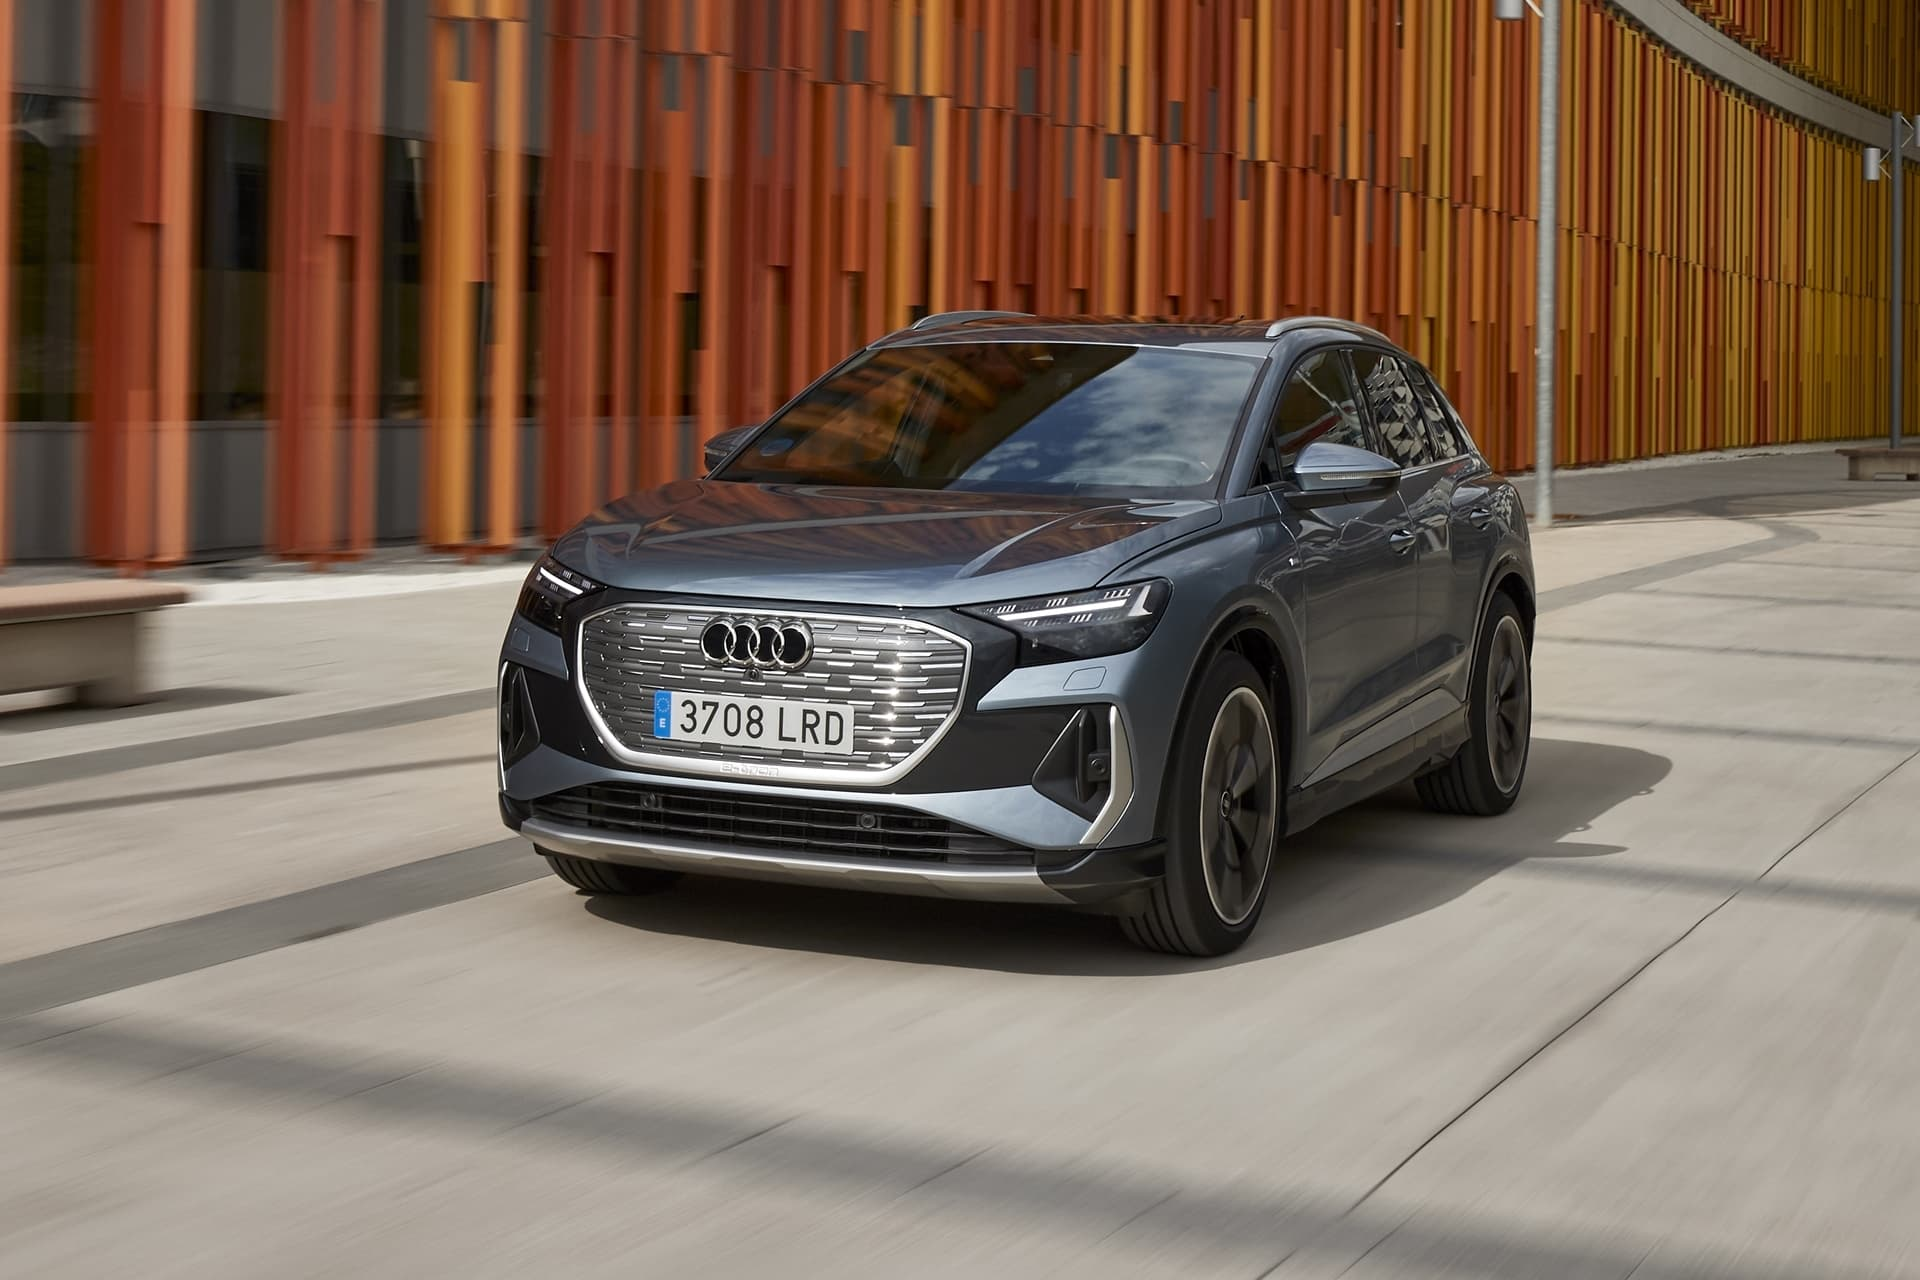 Audi Q4 E Tron 2021 0721 022